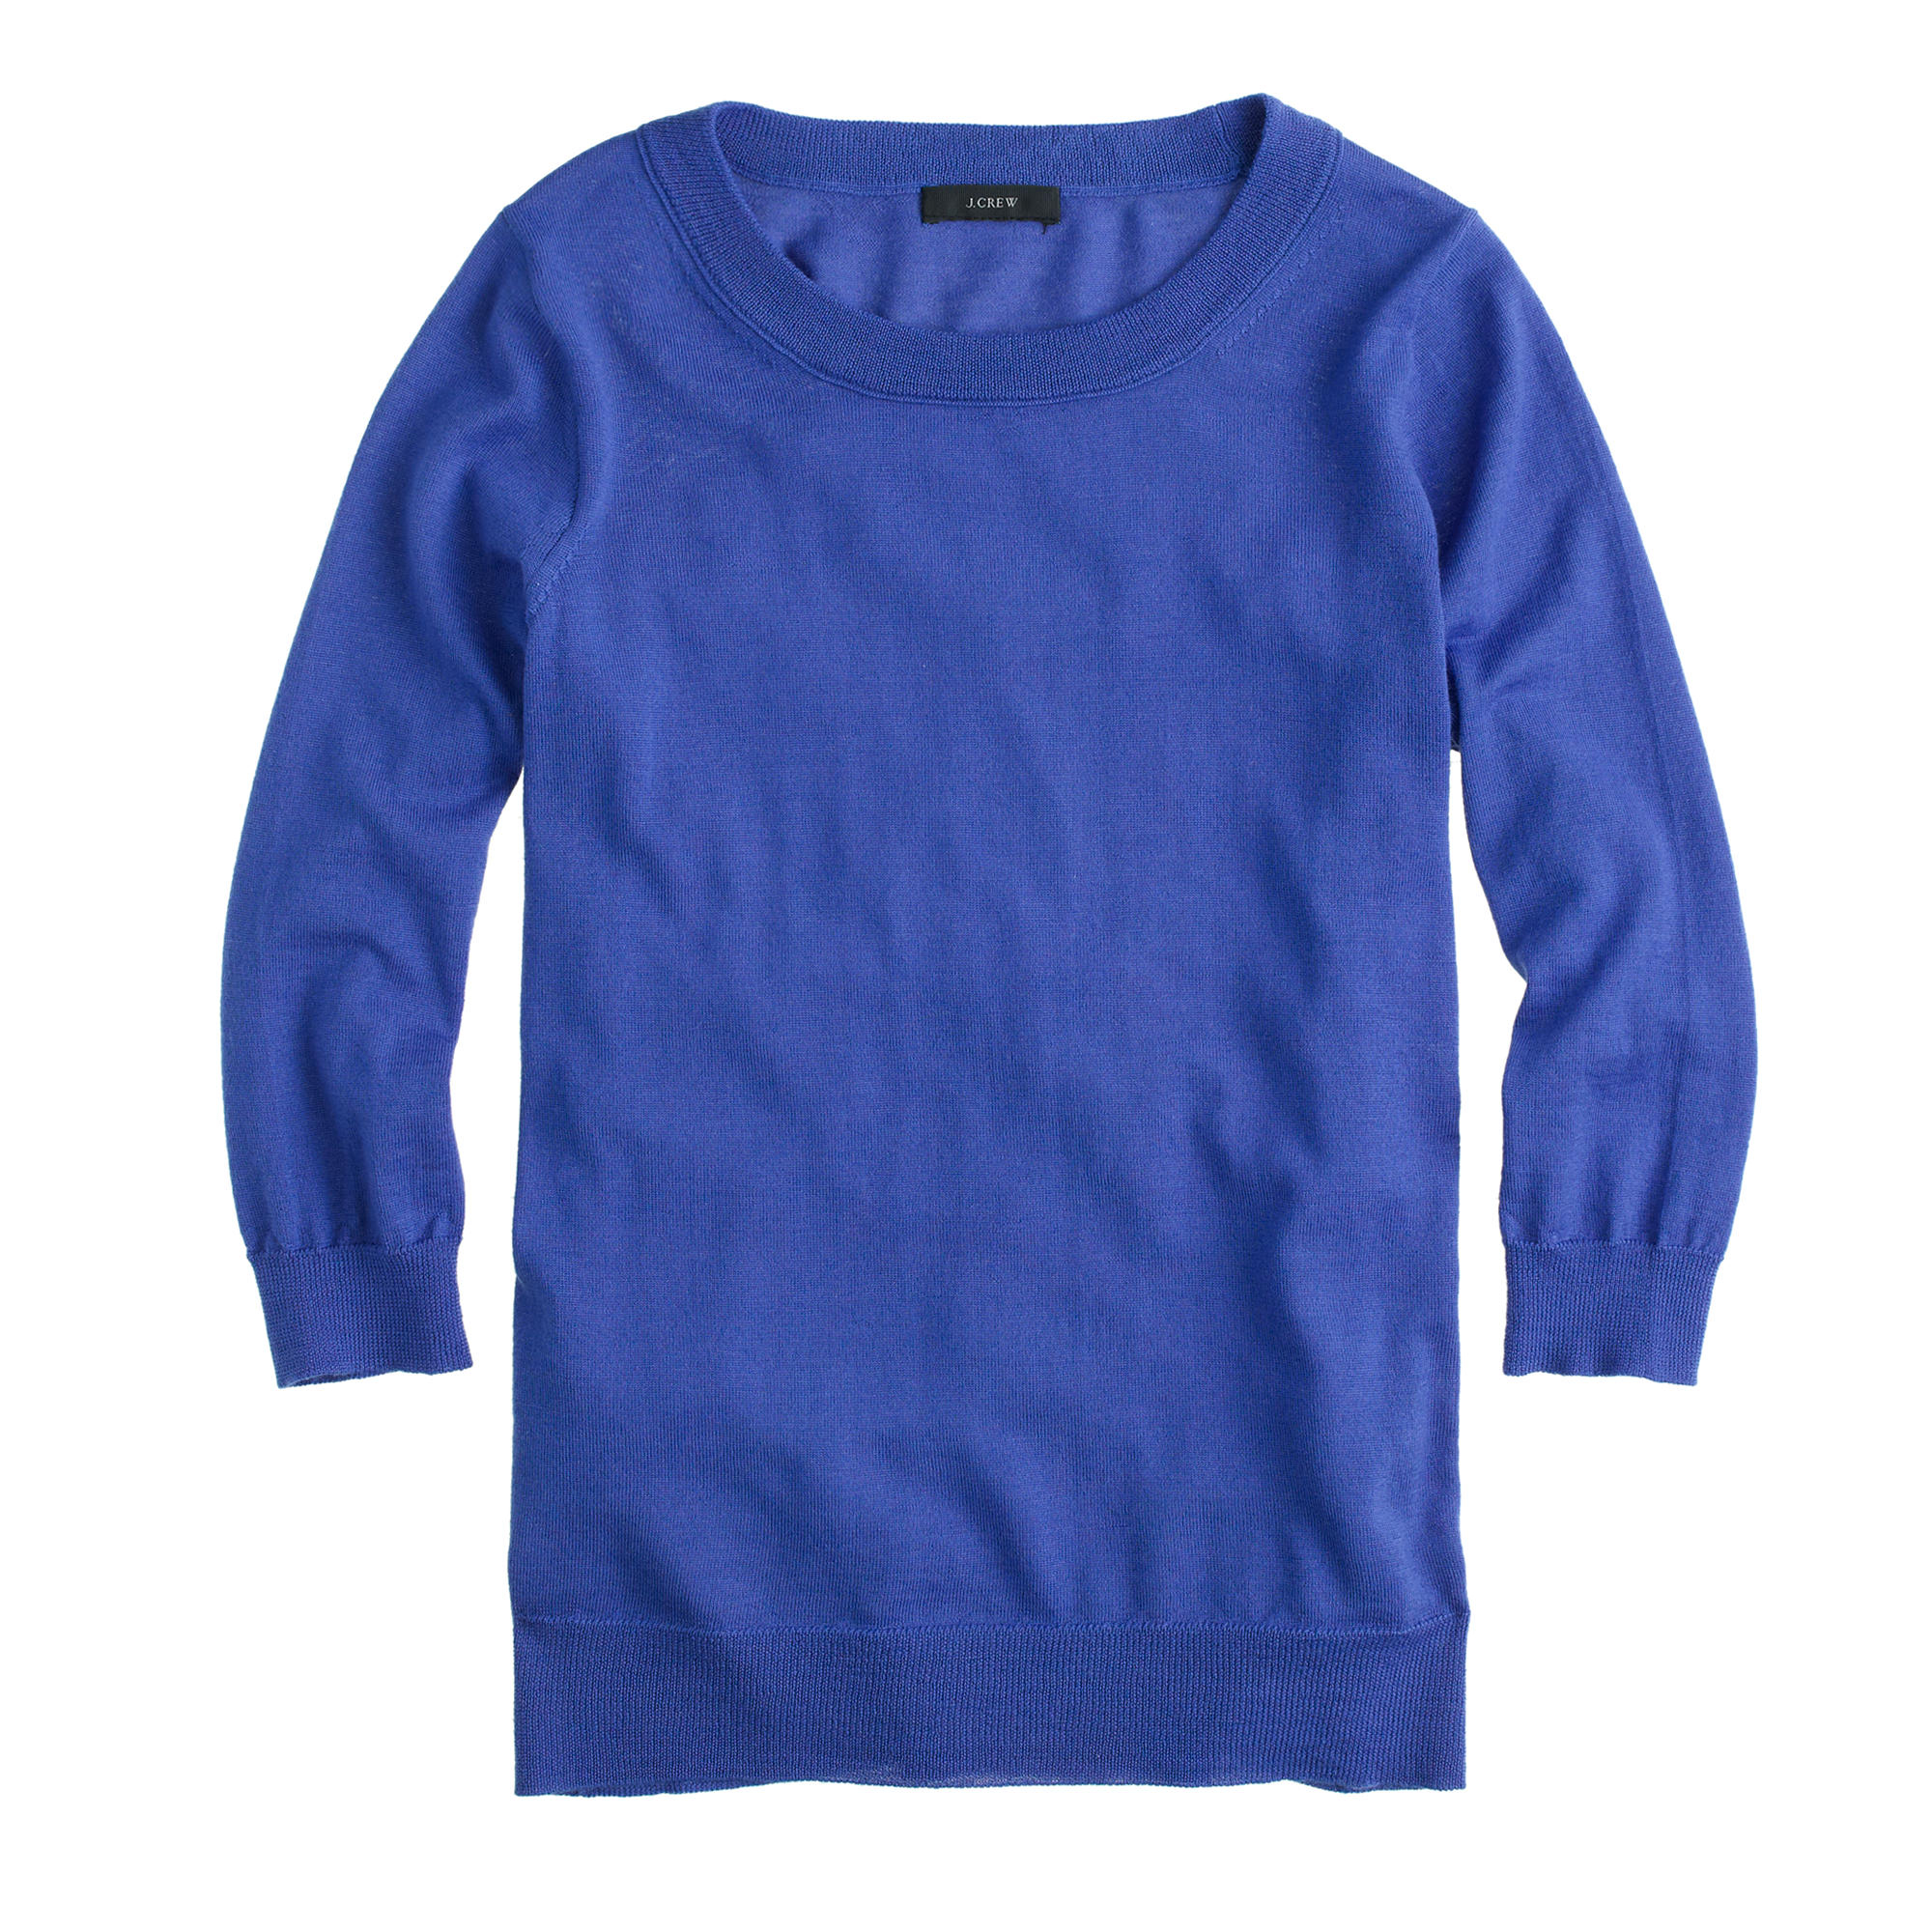 J.crew Merino Wool Tippi Sweater in Blue | Lyst